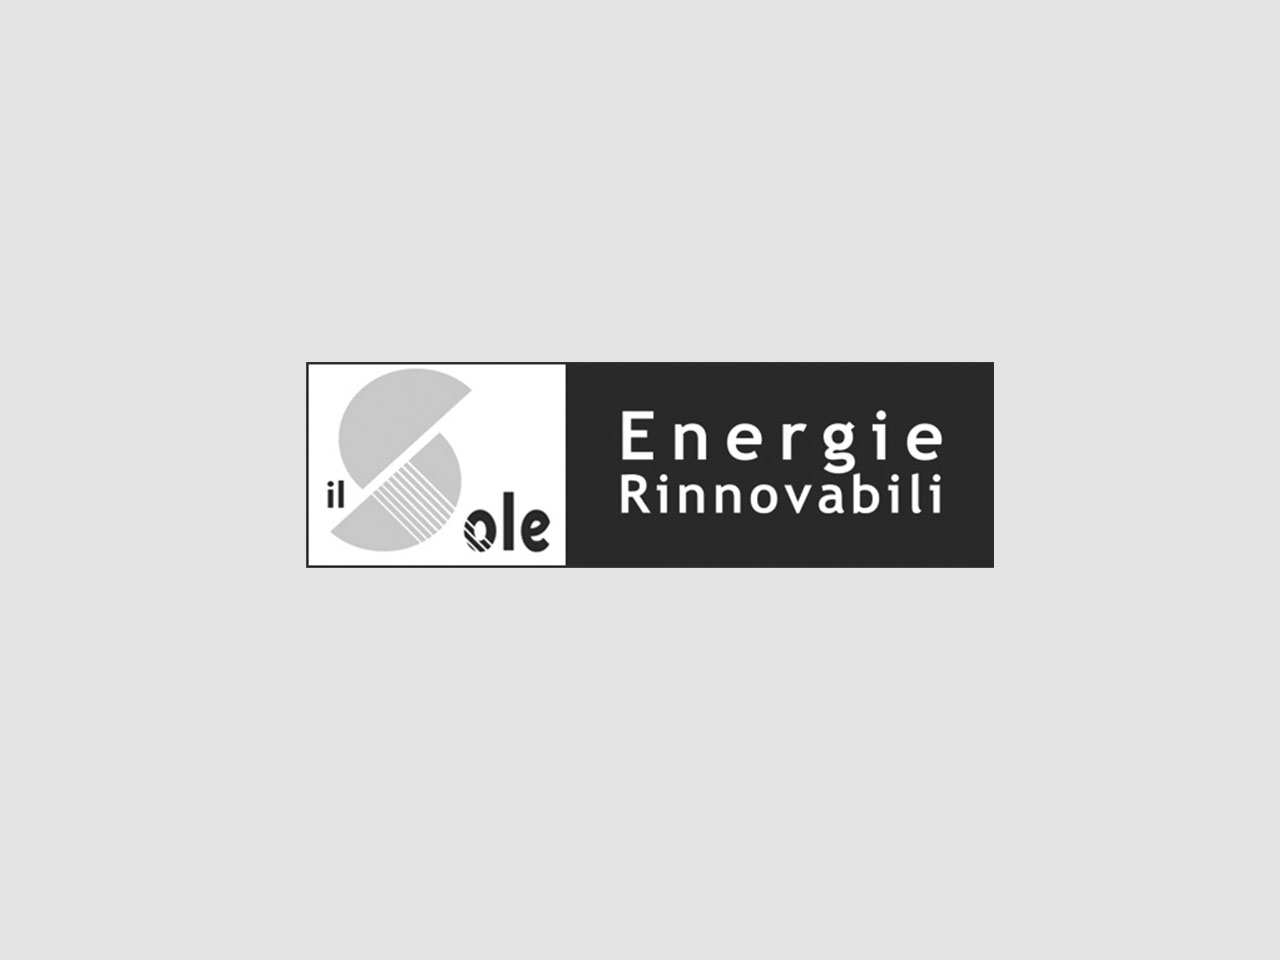 siti-internet-seo-newsletter-social-network-ol-sole-energie-rinnovabili--contessifostinelli-